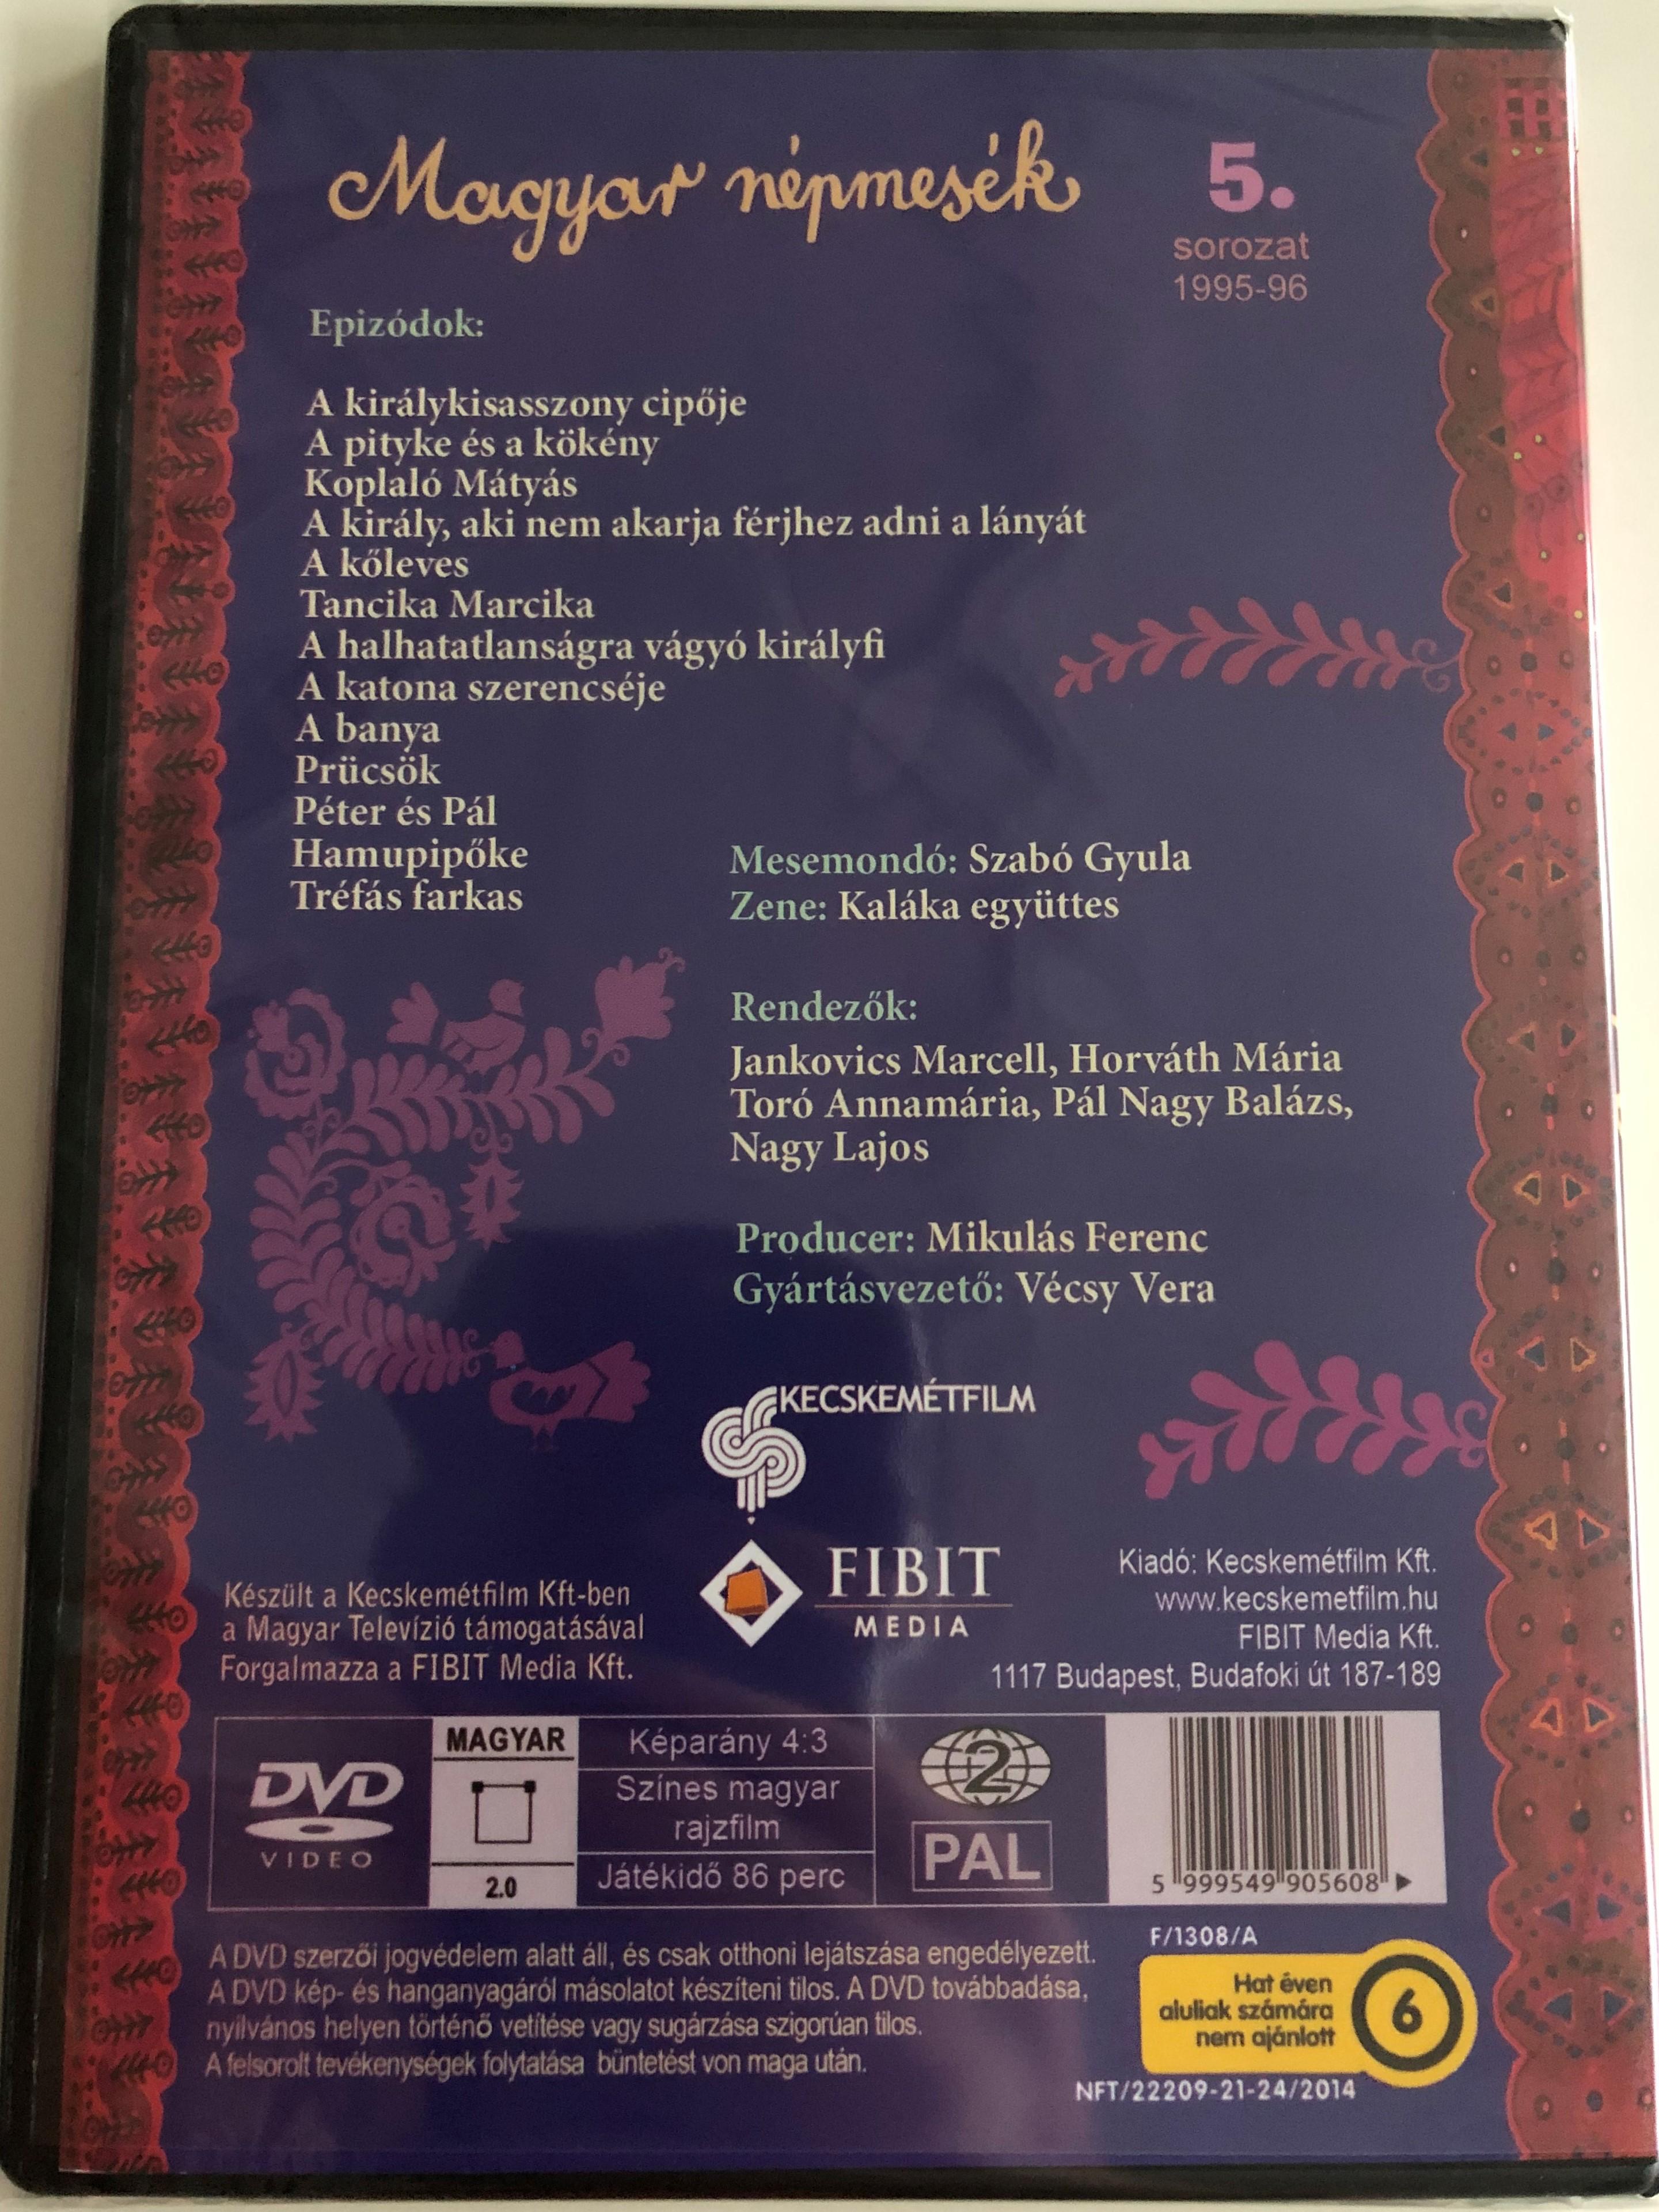 magyar-n-pmes-k-5.-a-kir-lykisasszony-cip-je-dvd-1995-1996-hungarian-folk-tales-for-children-2-.jpg